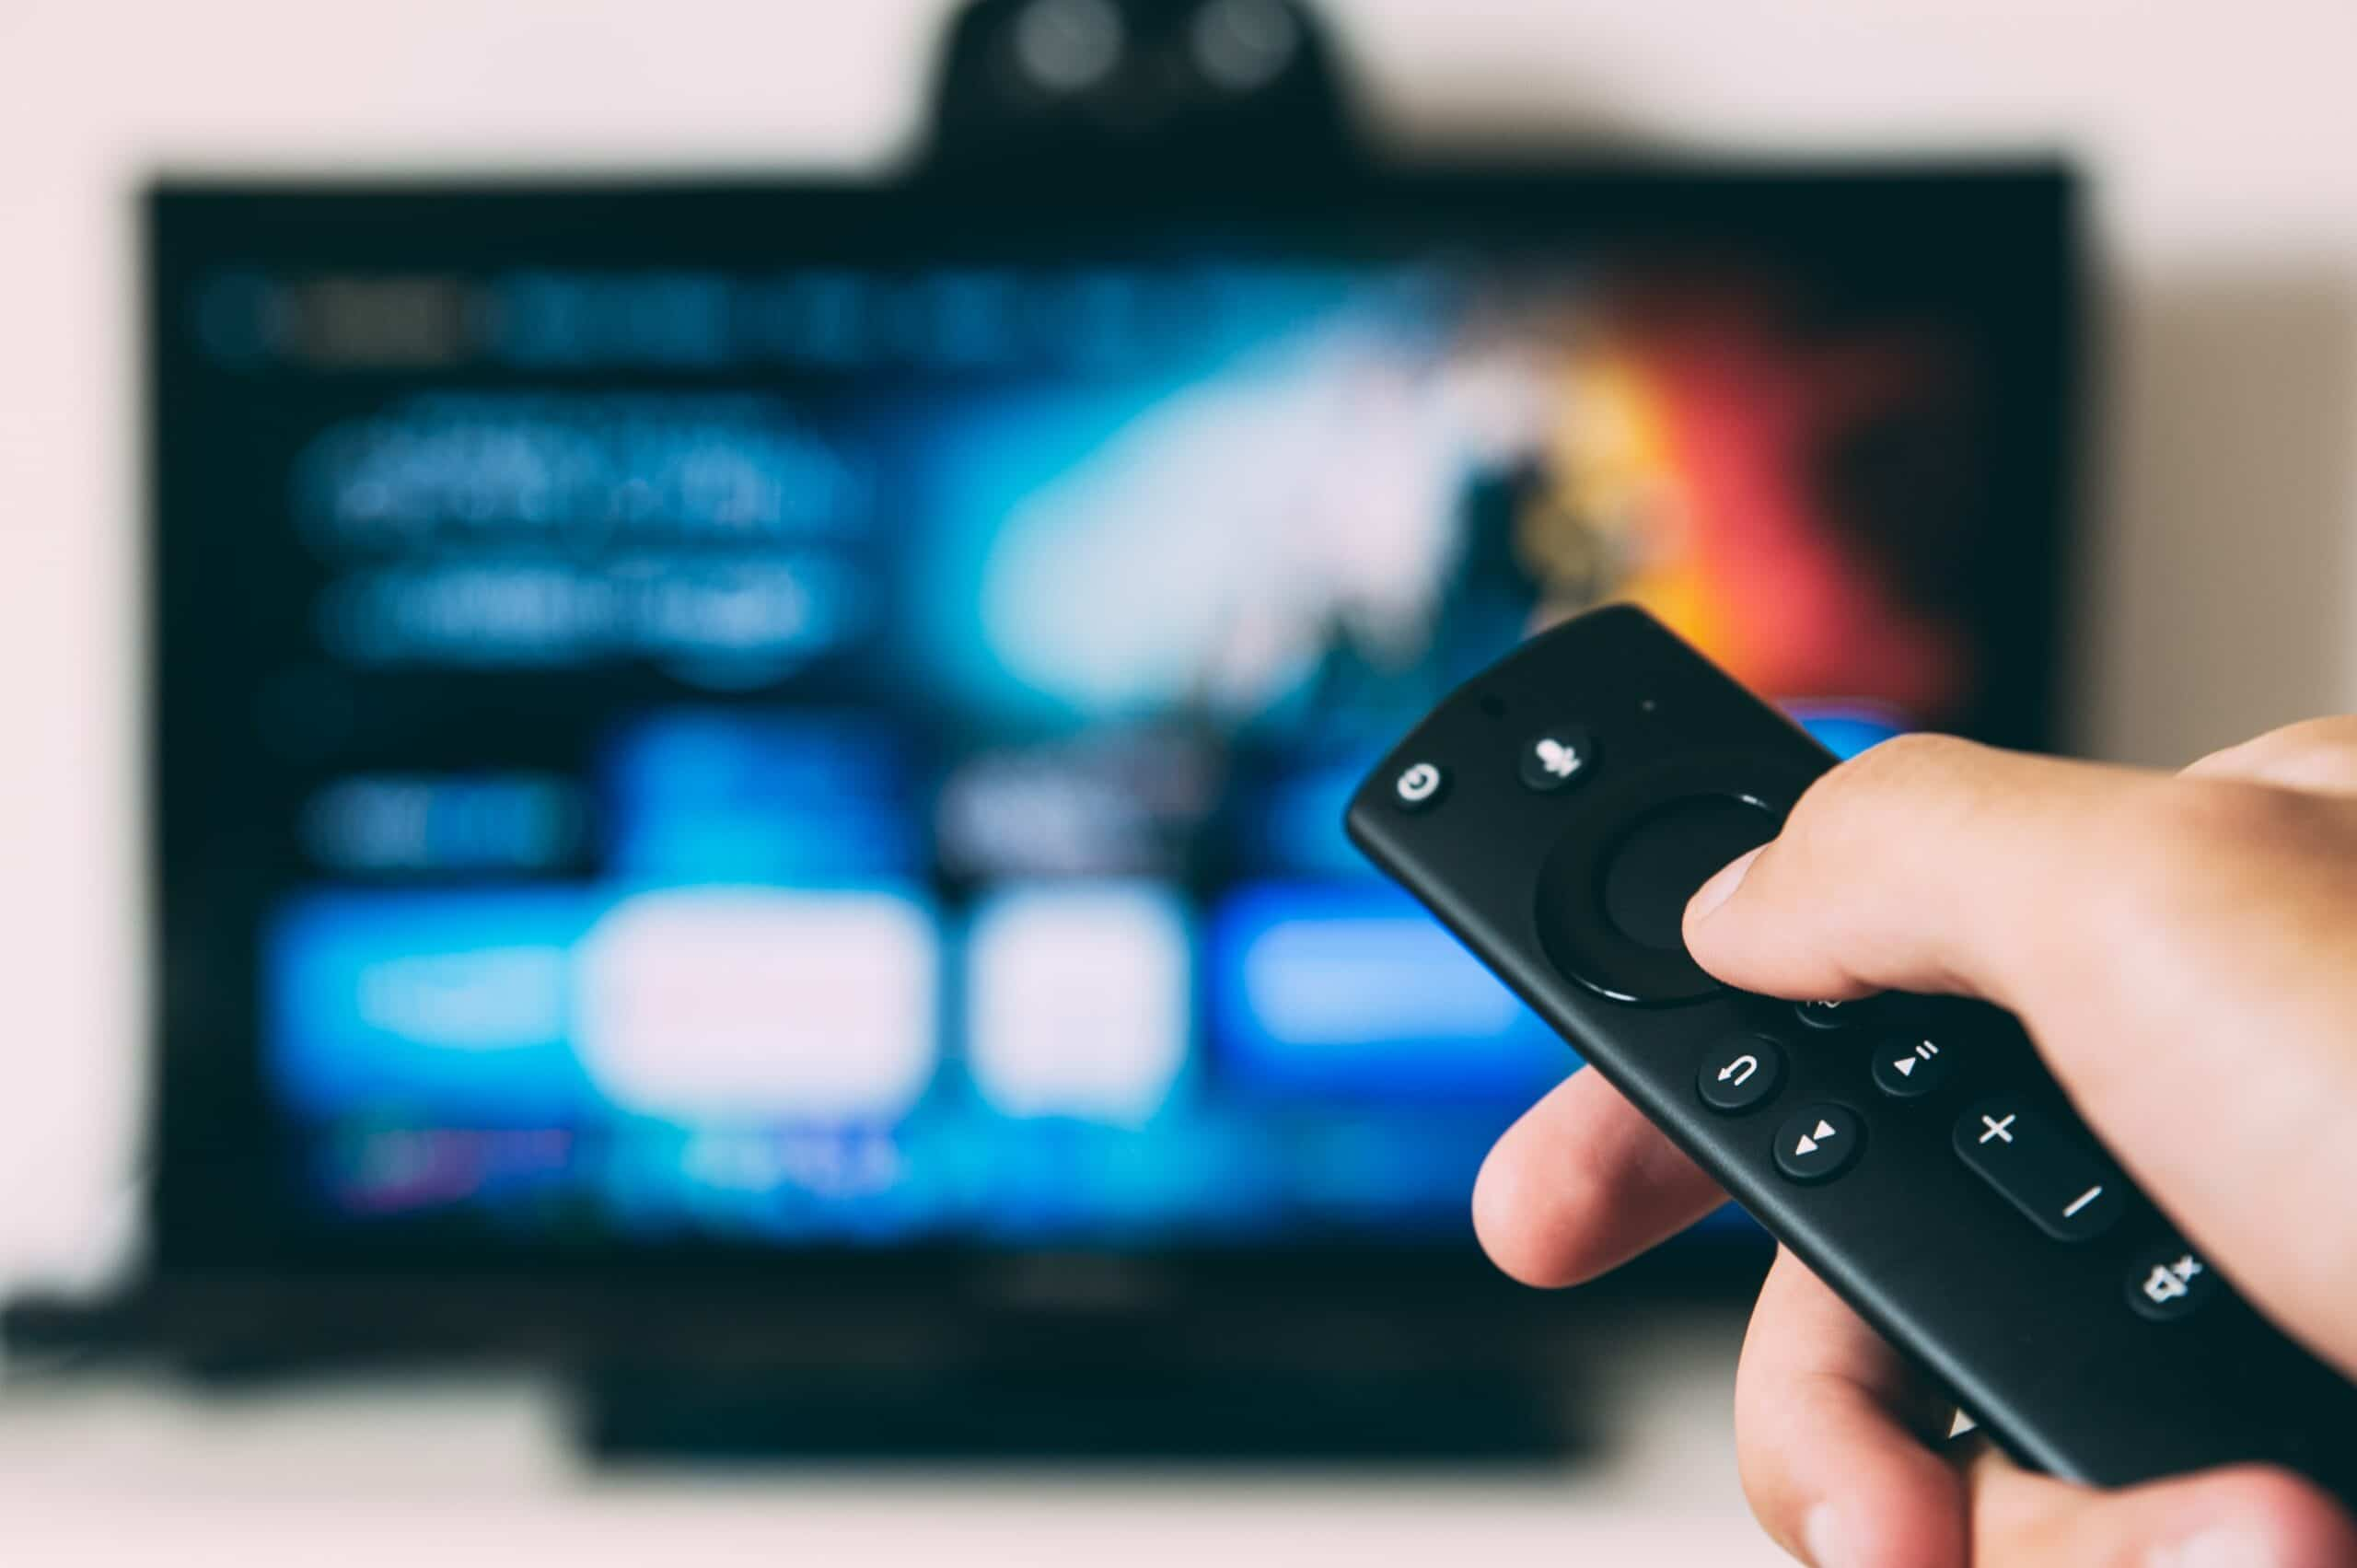 Nuovi canali Amazon Prime Video a 0,99 euro per i primi 3 mesi thumbnail